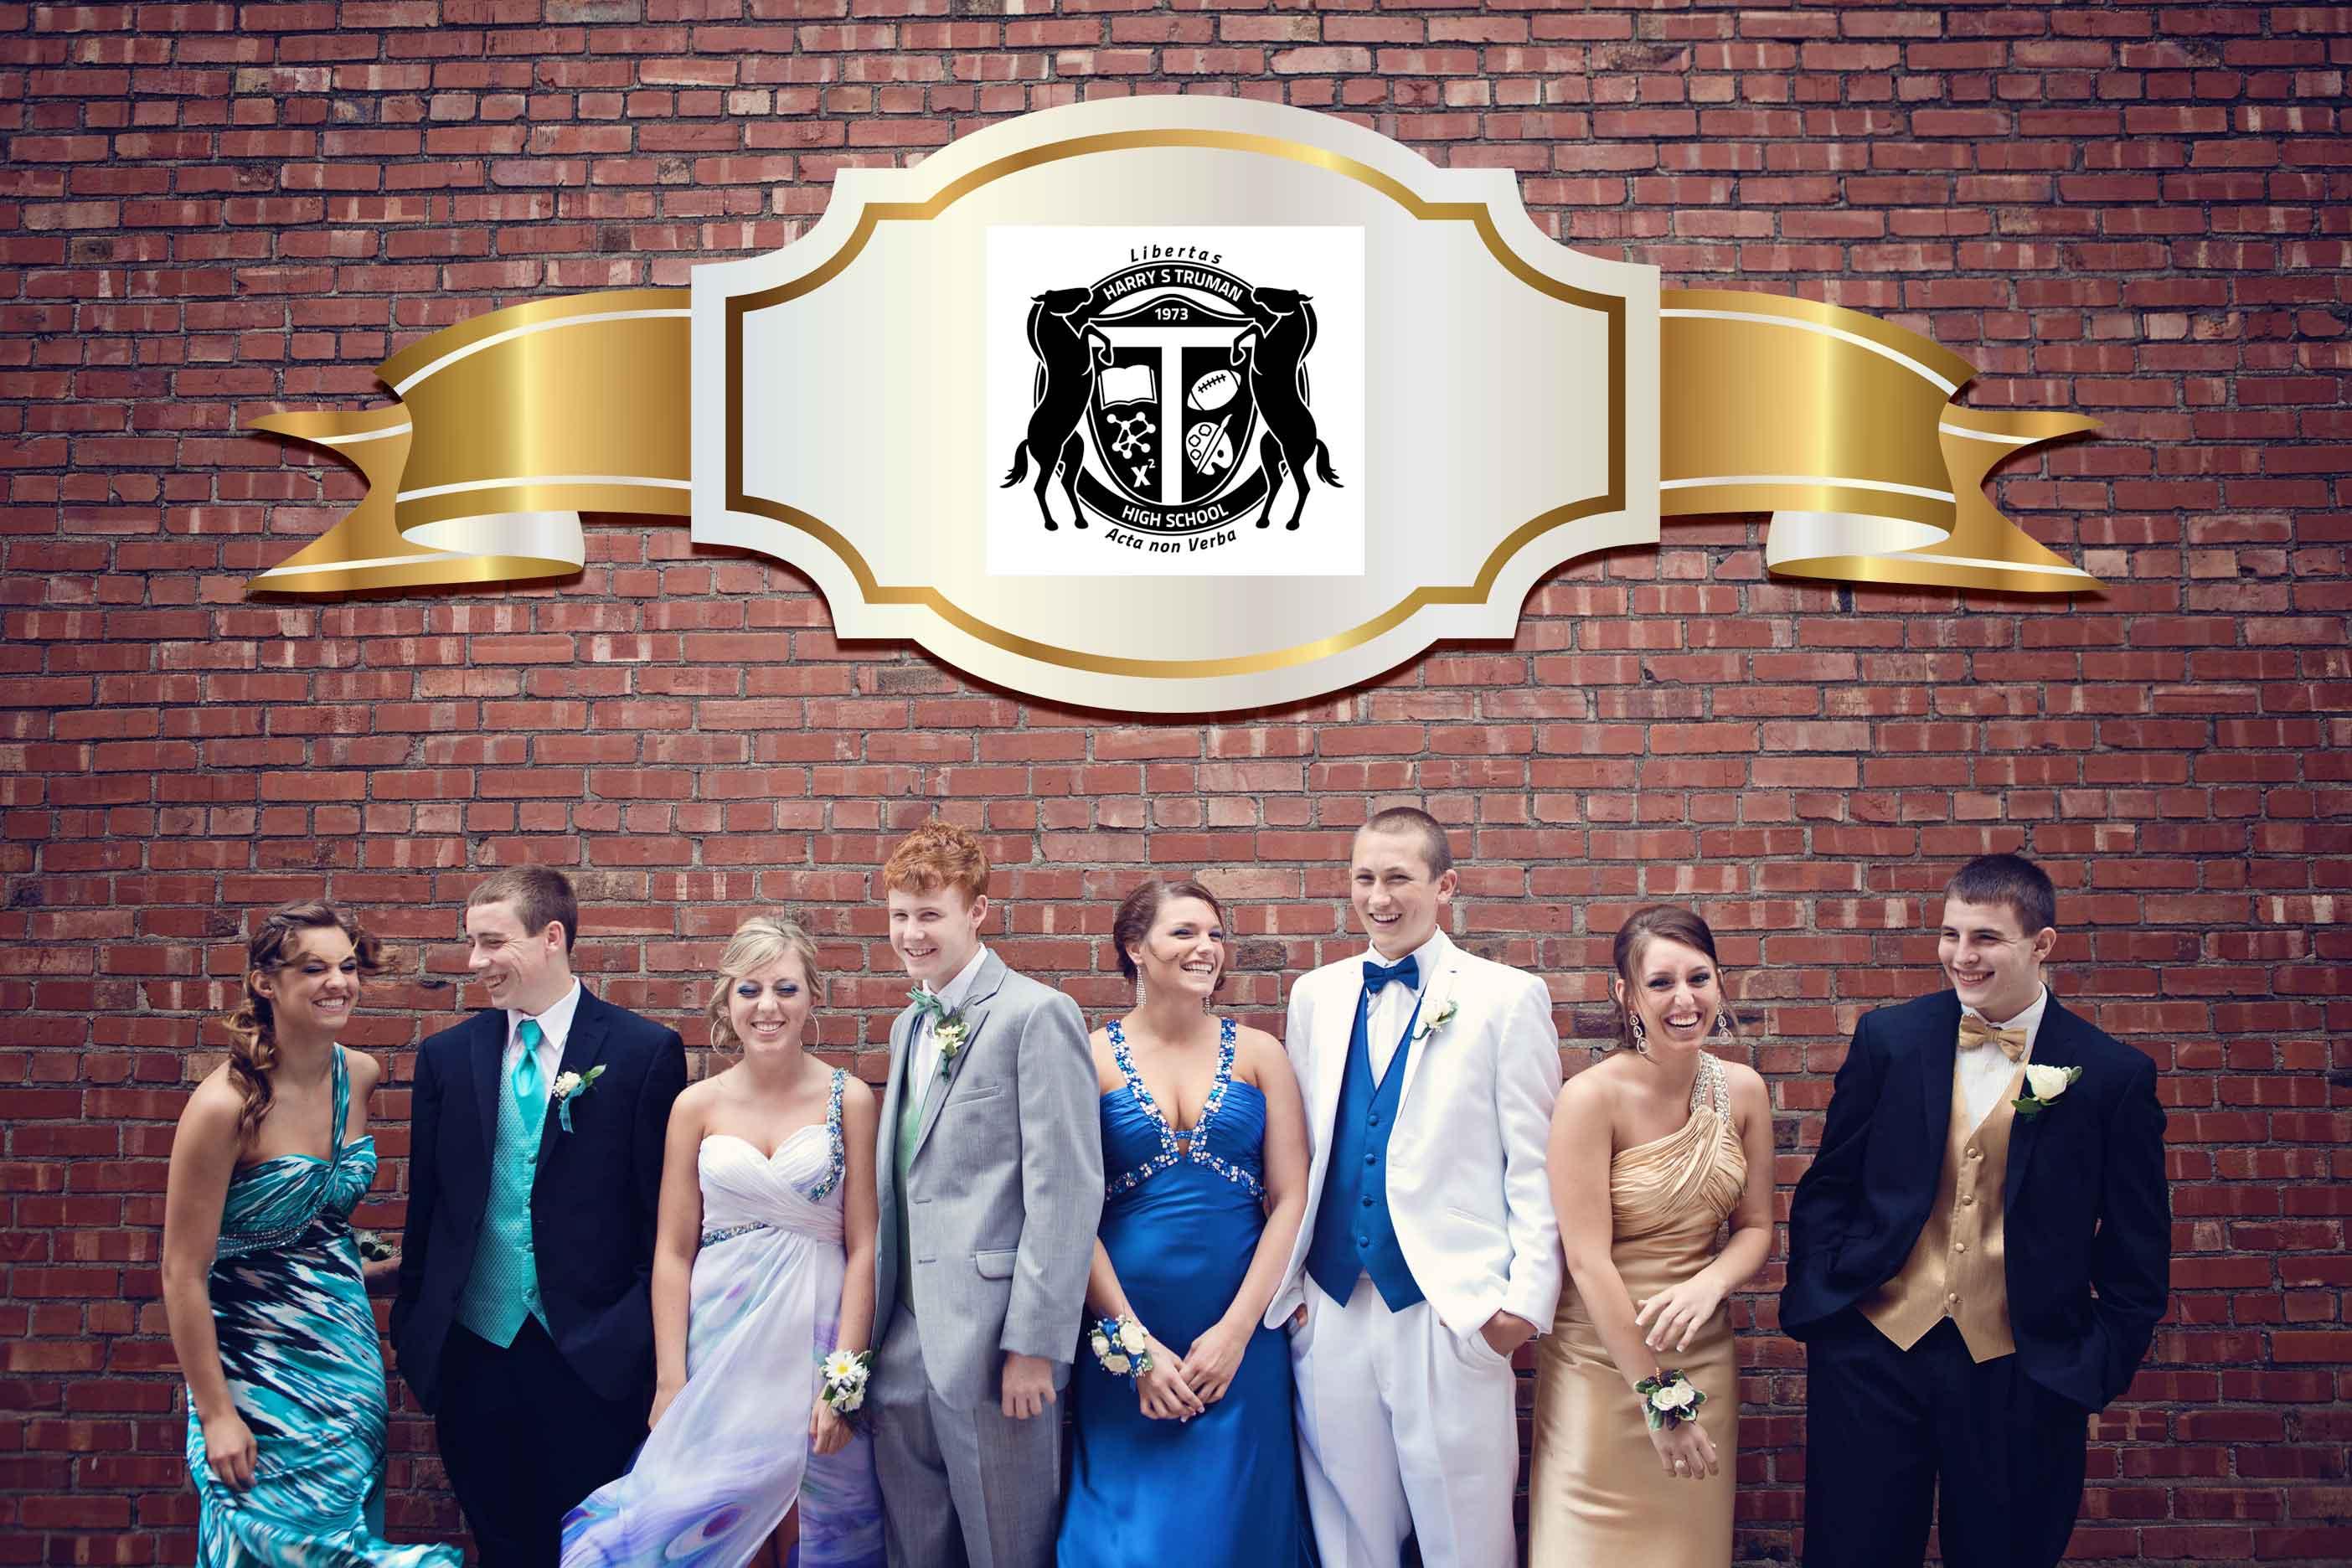 harry s truman high school prom